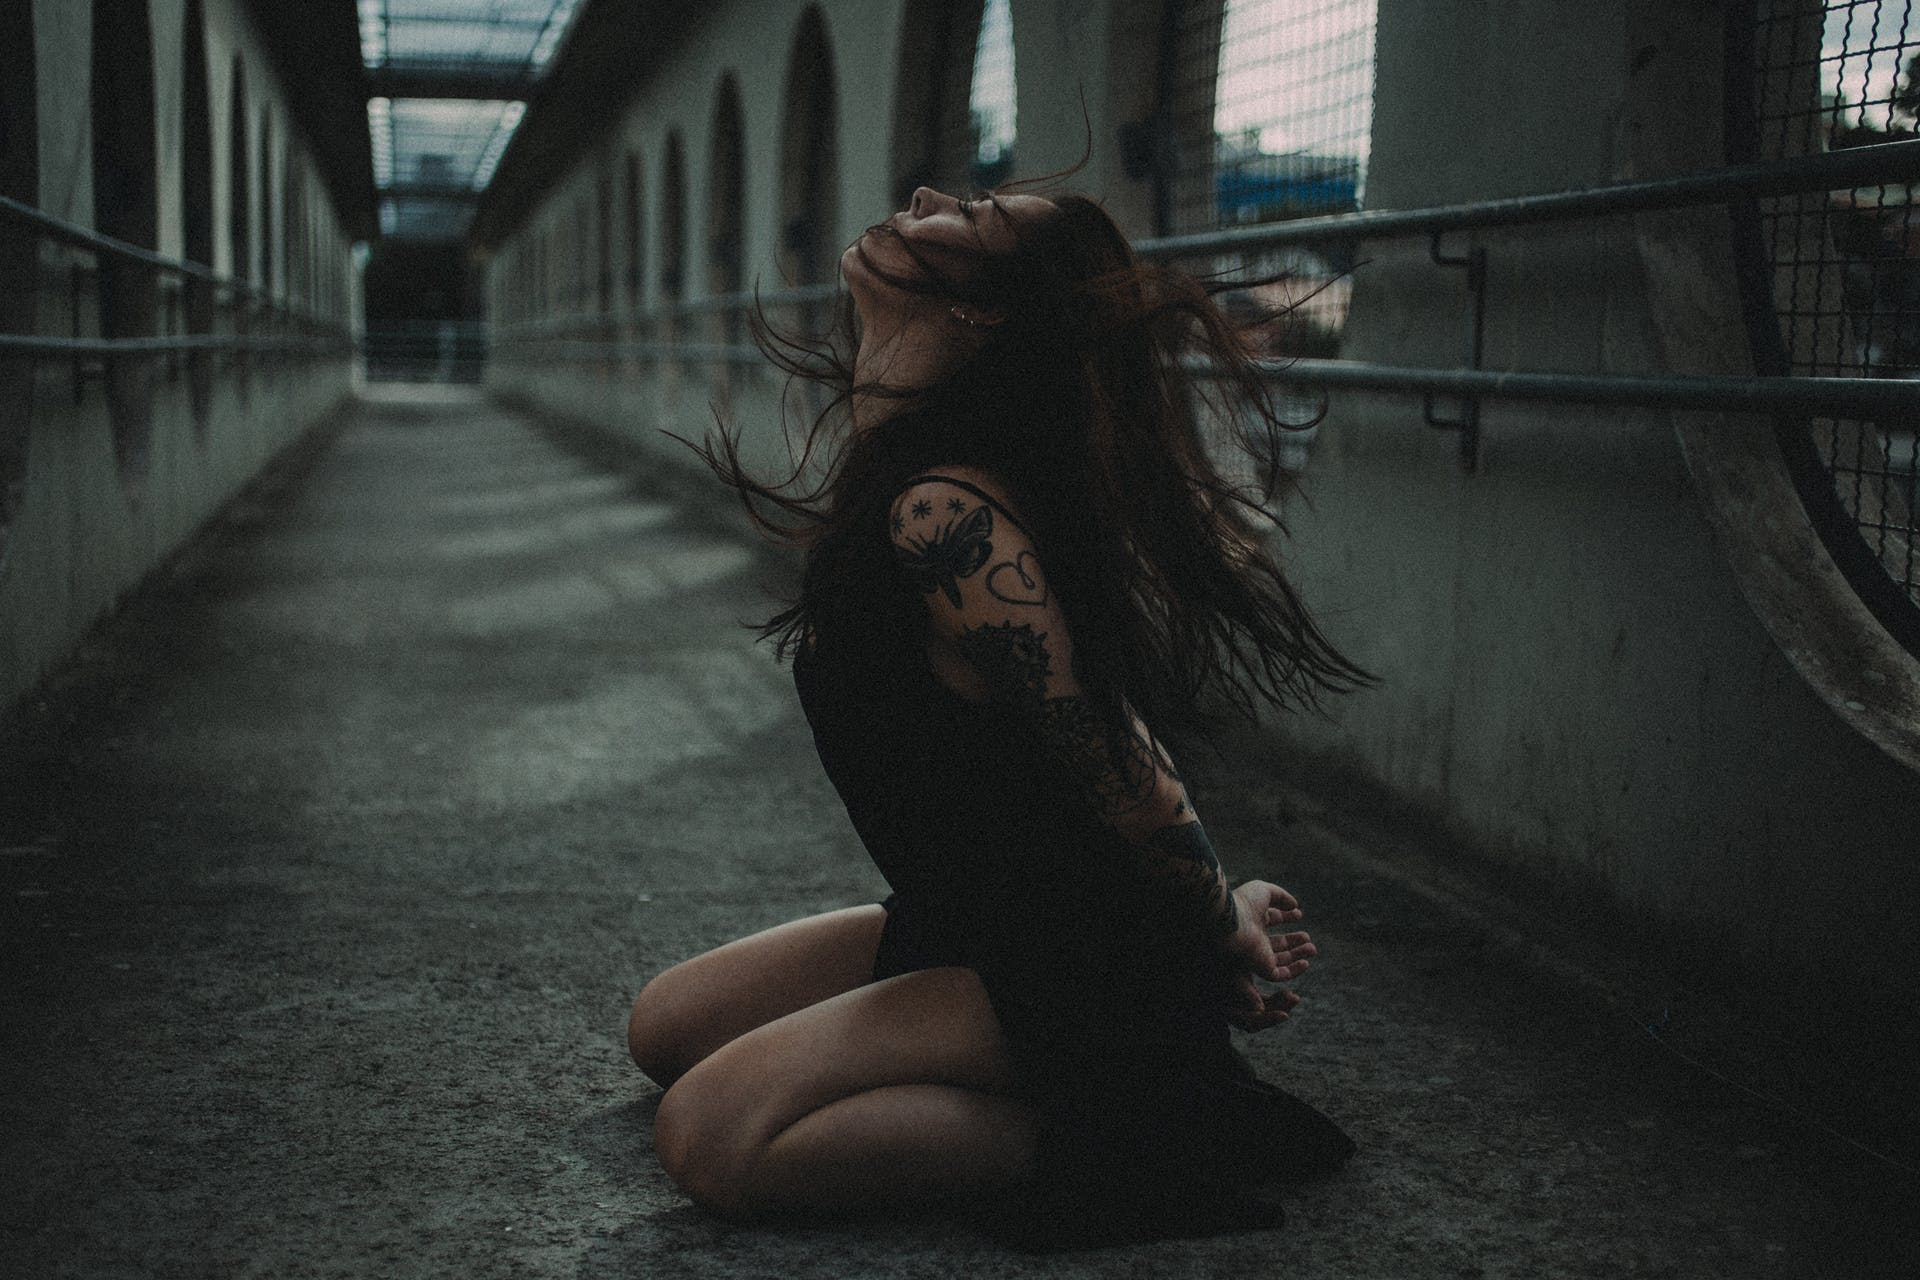 sexy person woman tattoo bridge style photoshoot capture street hairstyle